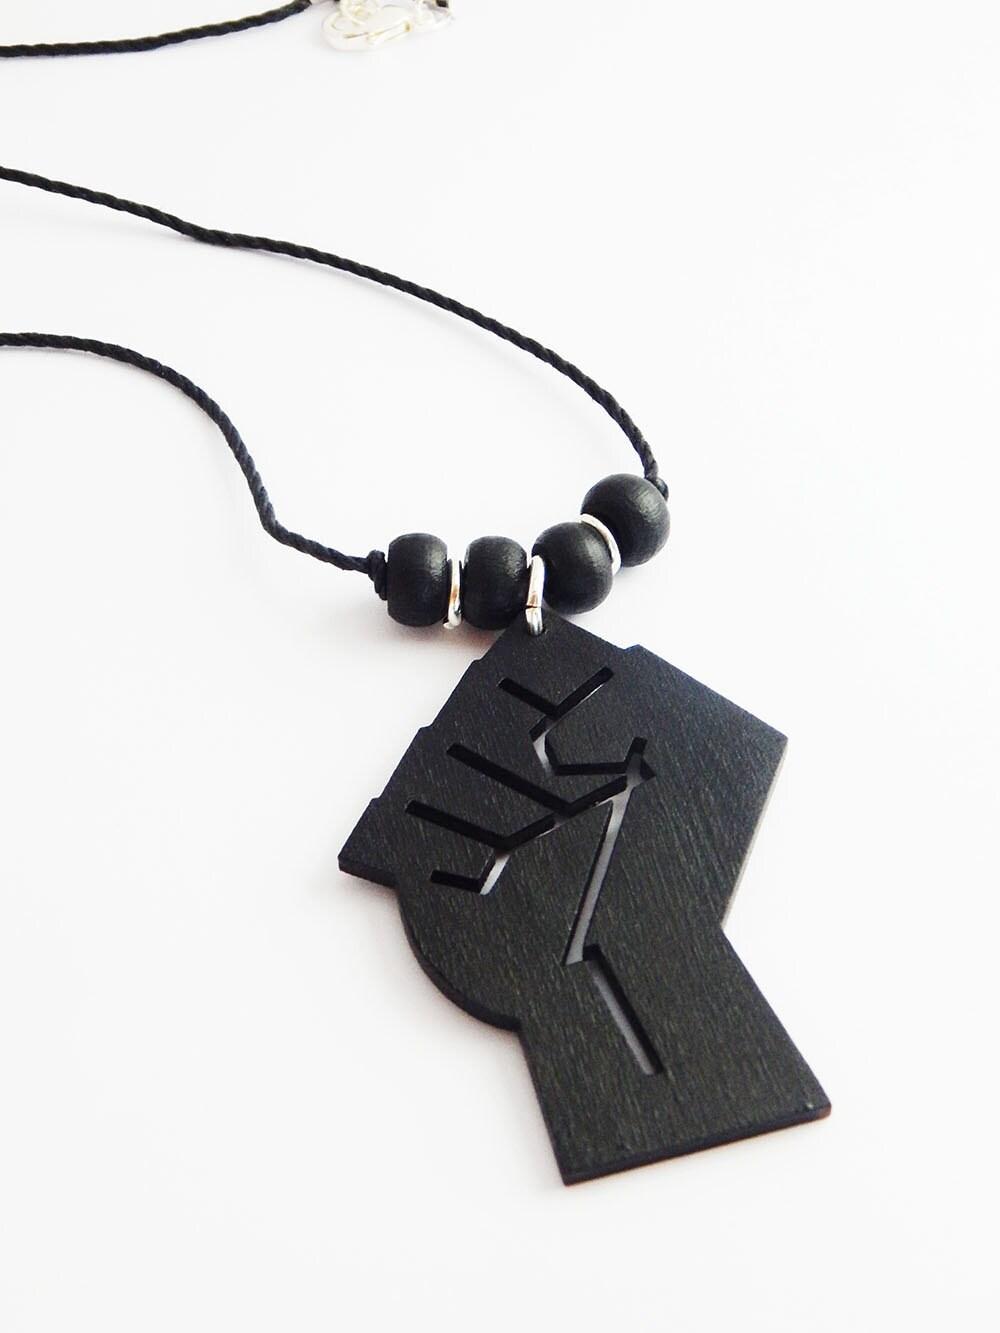 Black fist necklace